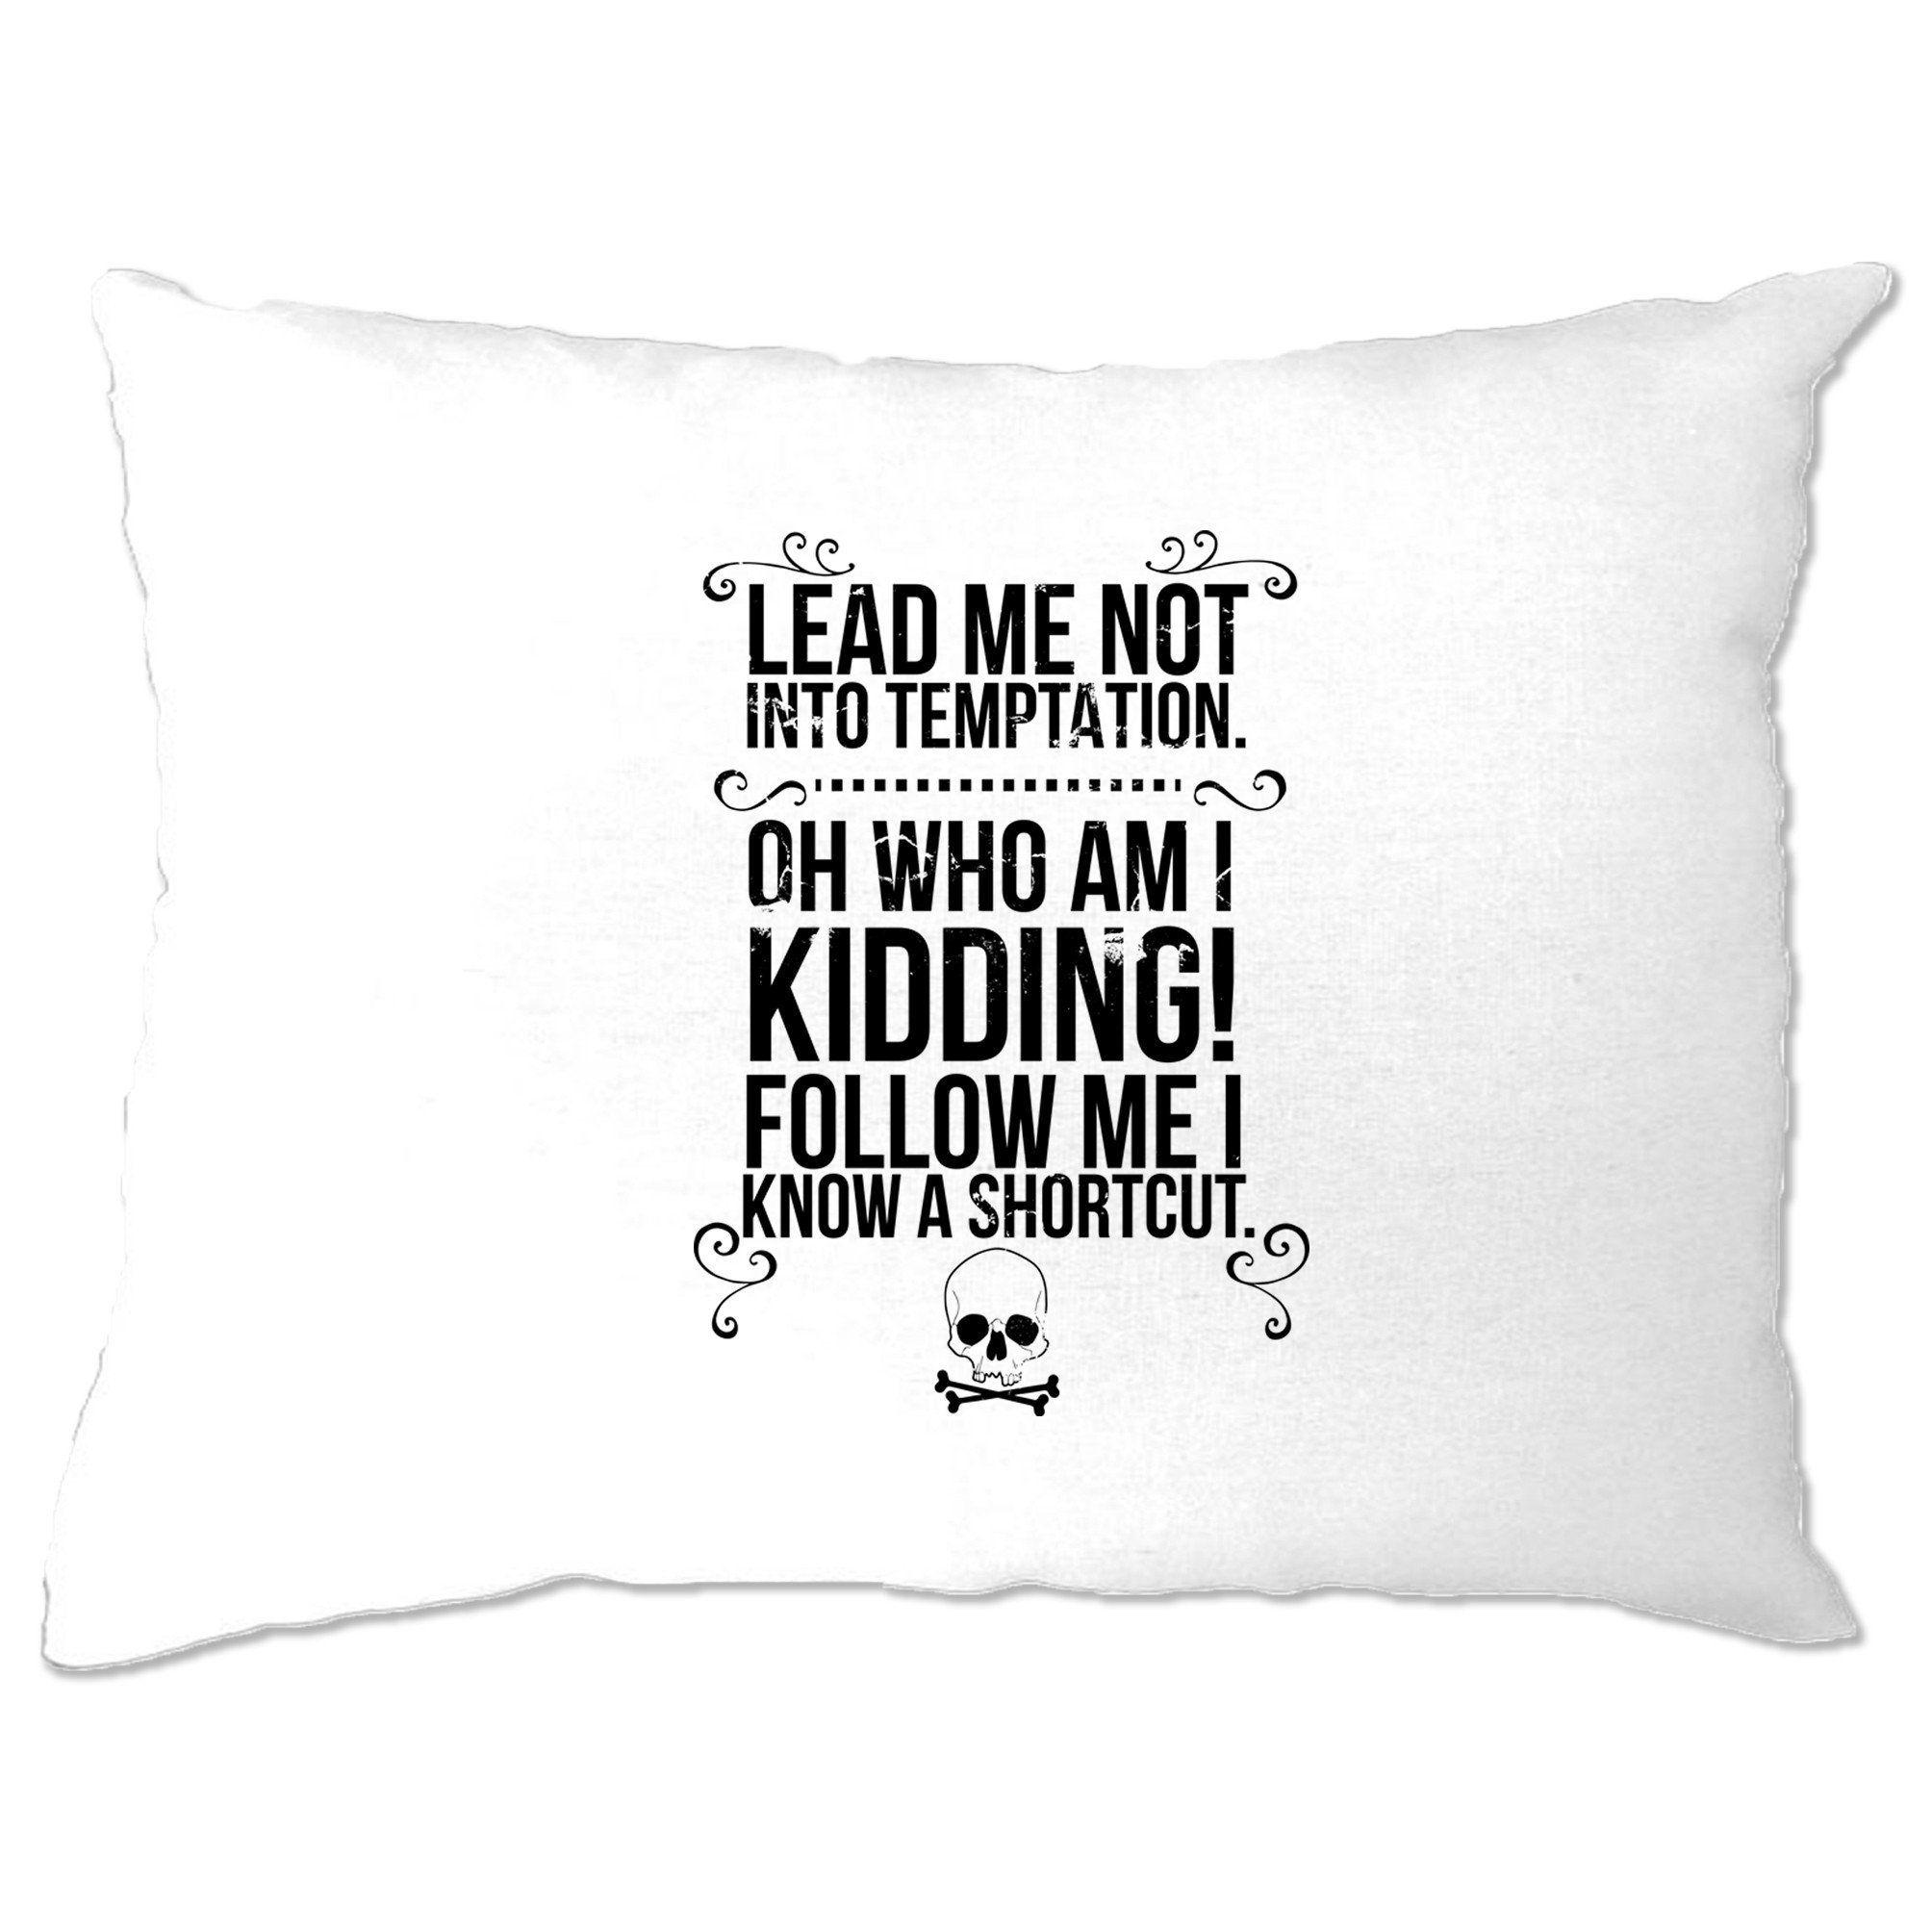 Novelty Pillow Case Lead Me Not Into Temptation Slogan